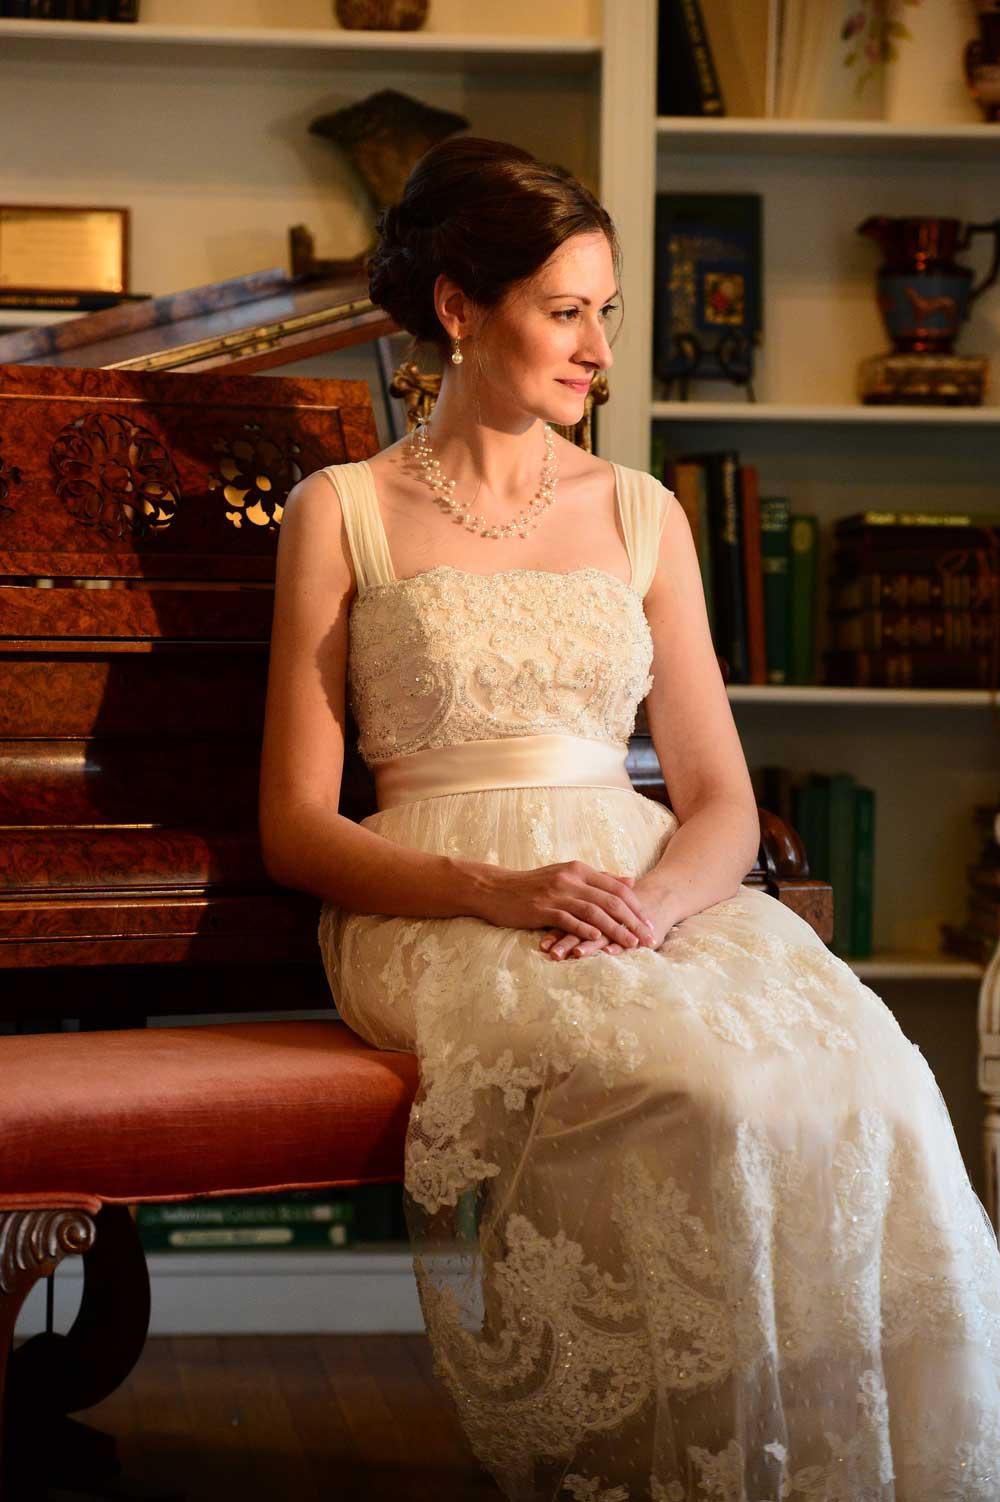 marietta-garden-center-winter-wedding-(4) | Marietta Educational ...